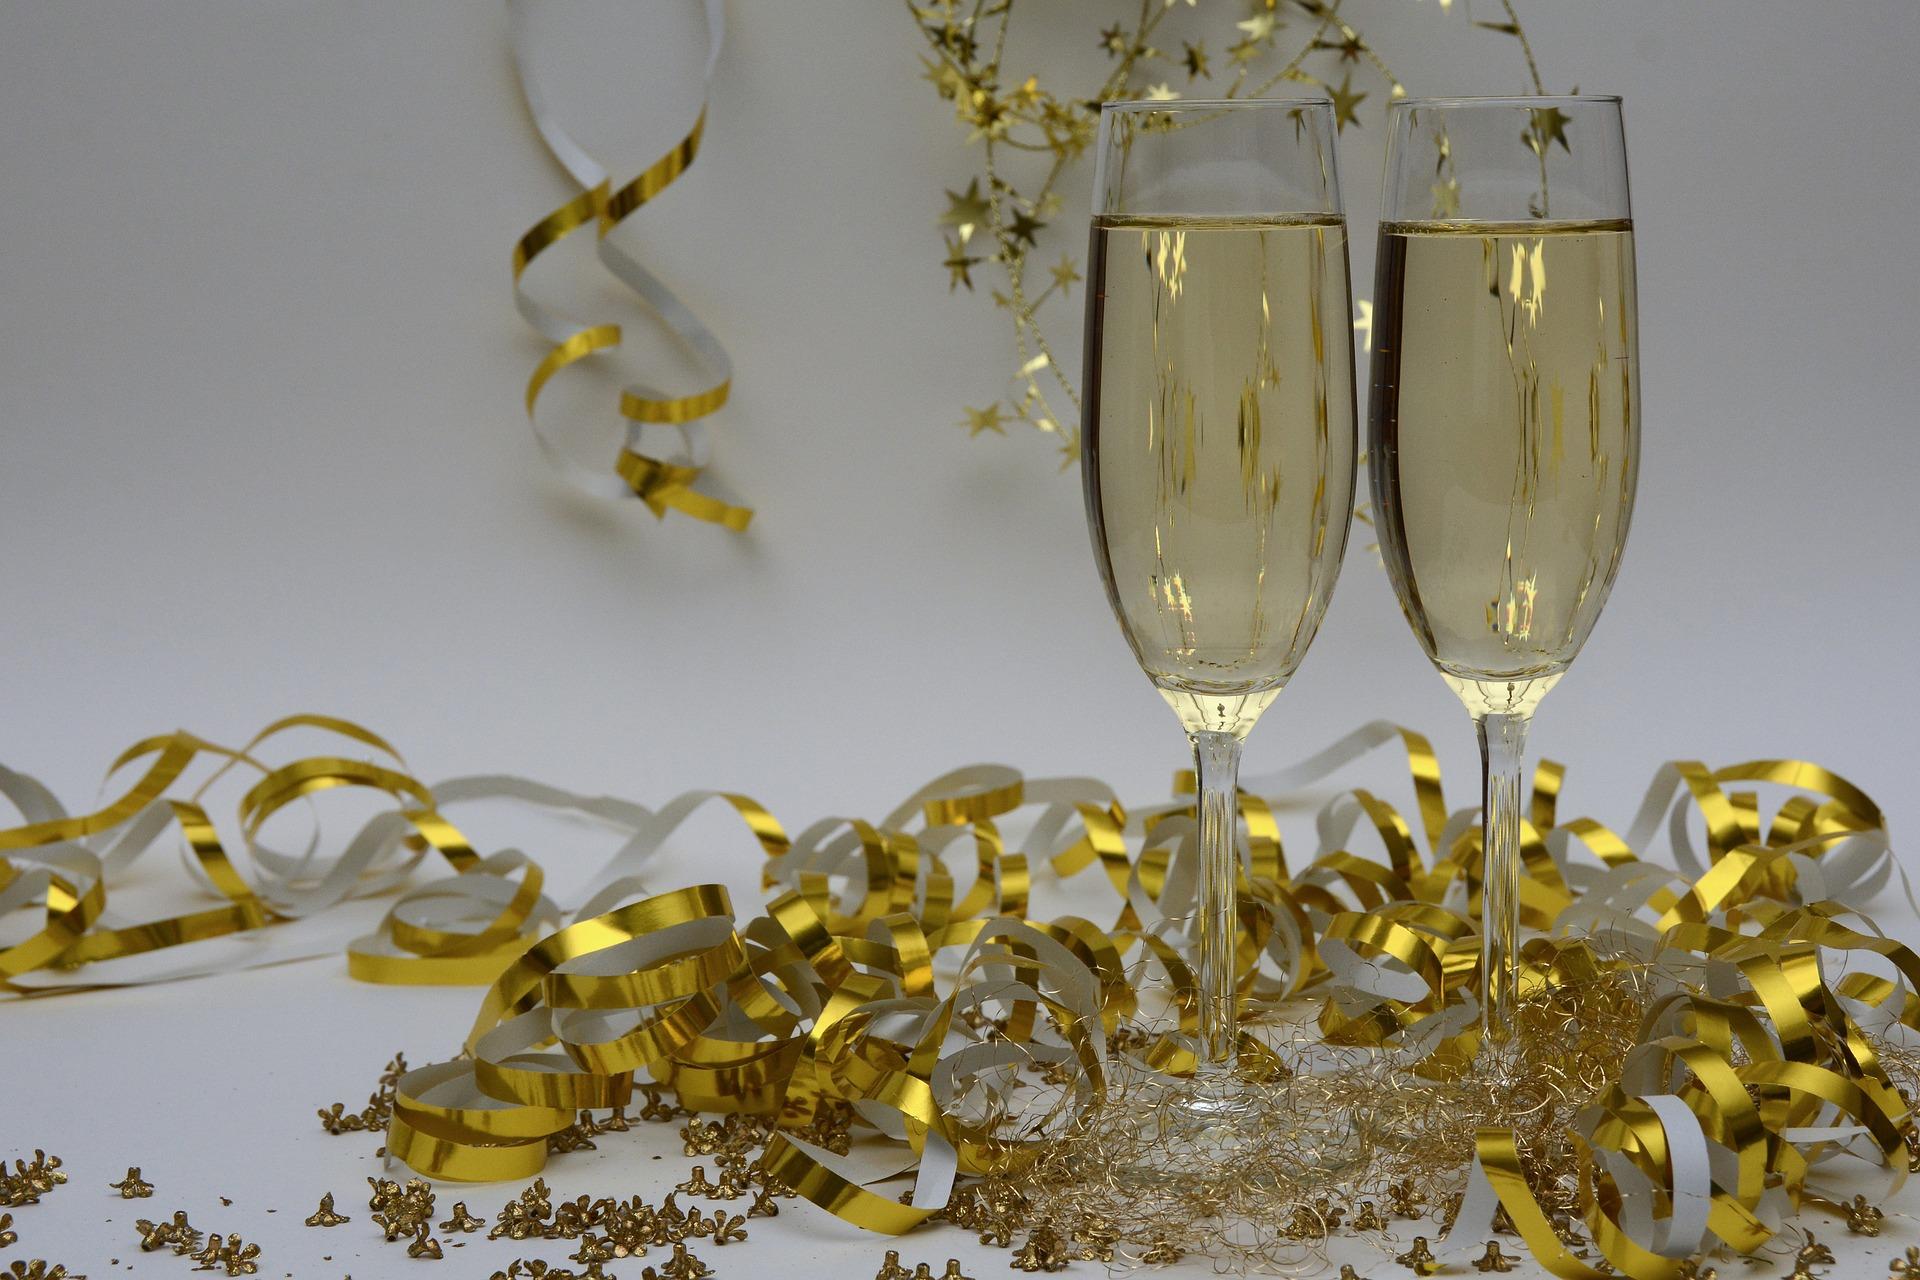 new-years-eve-1905143_1920.jpg